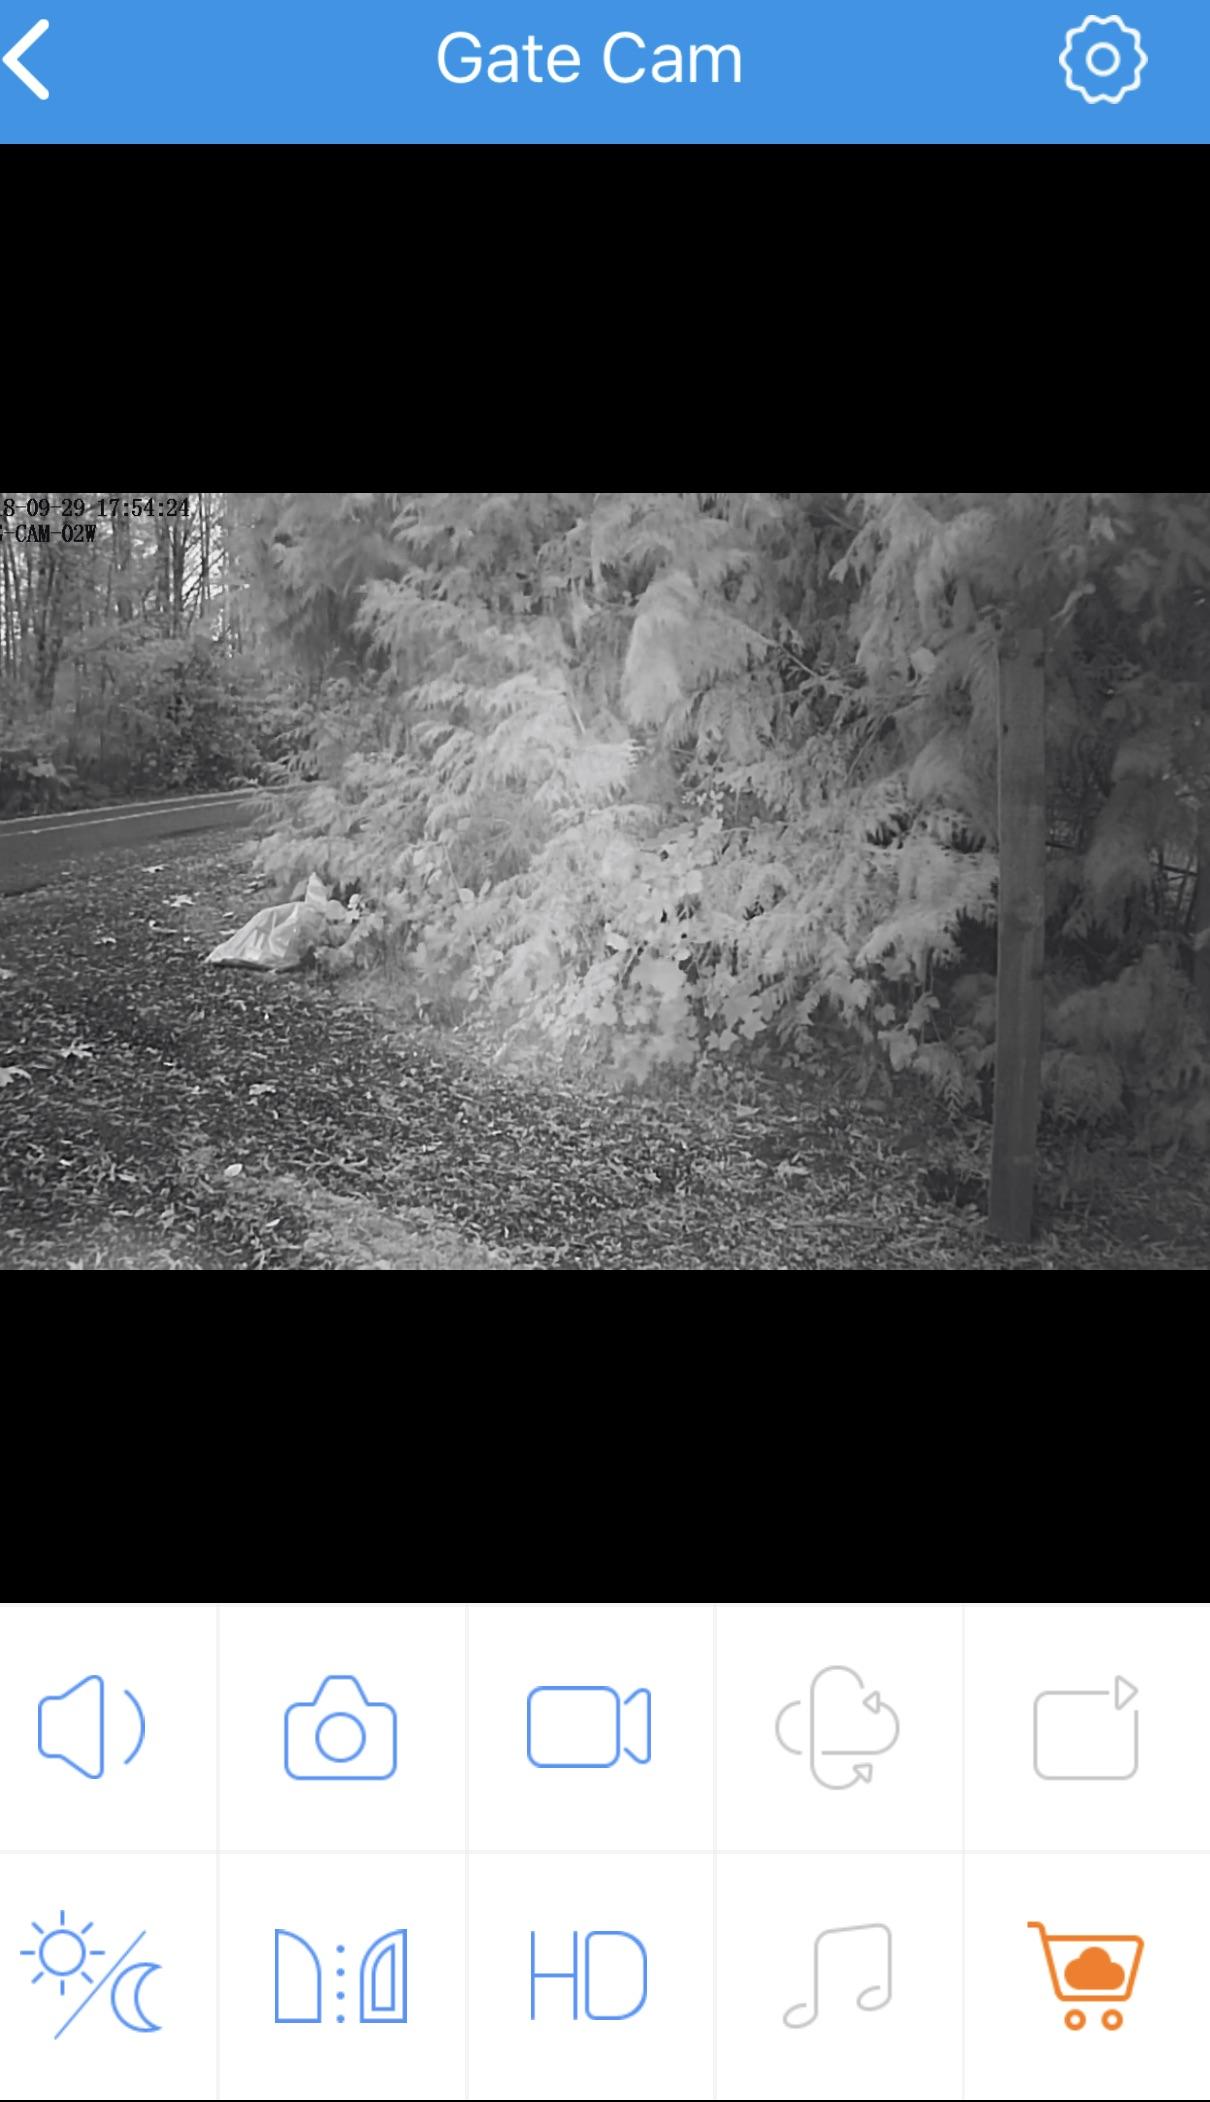 Gate cam night vision